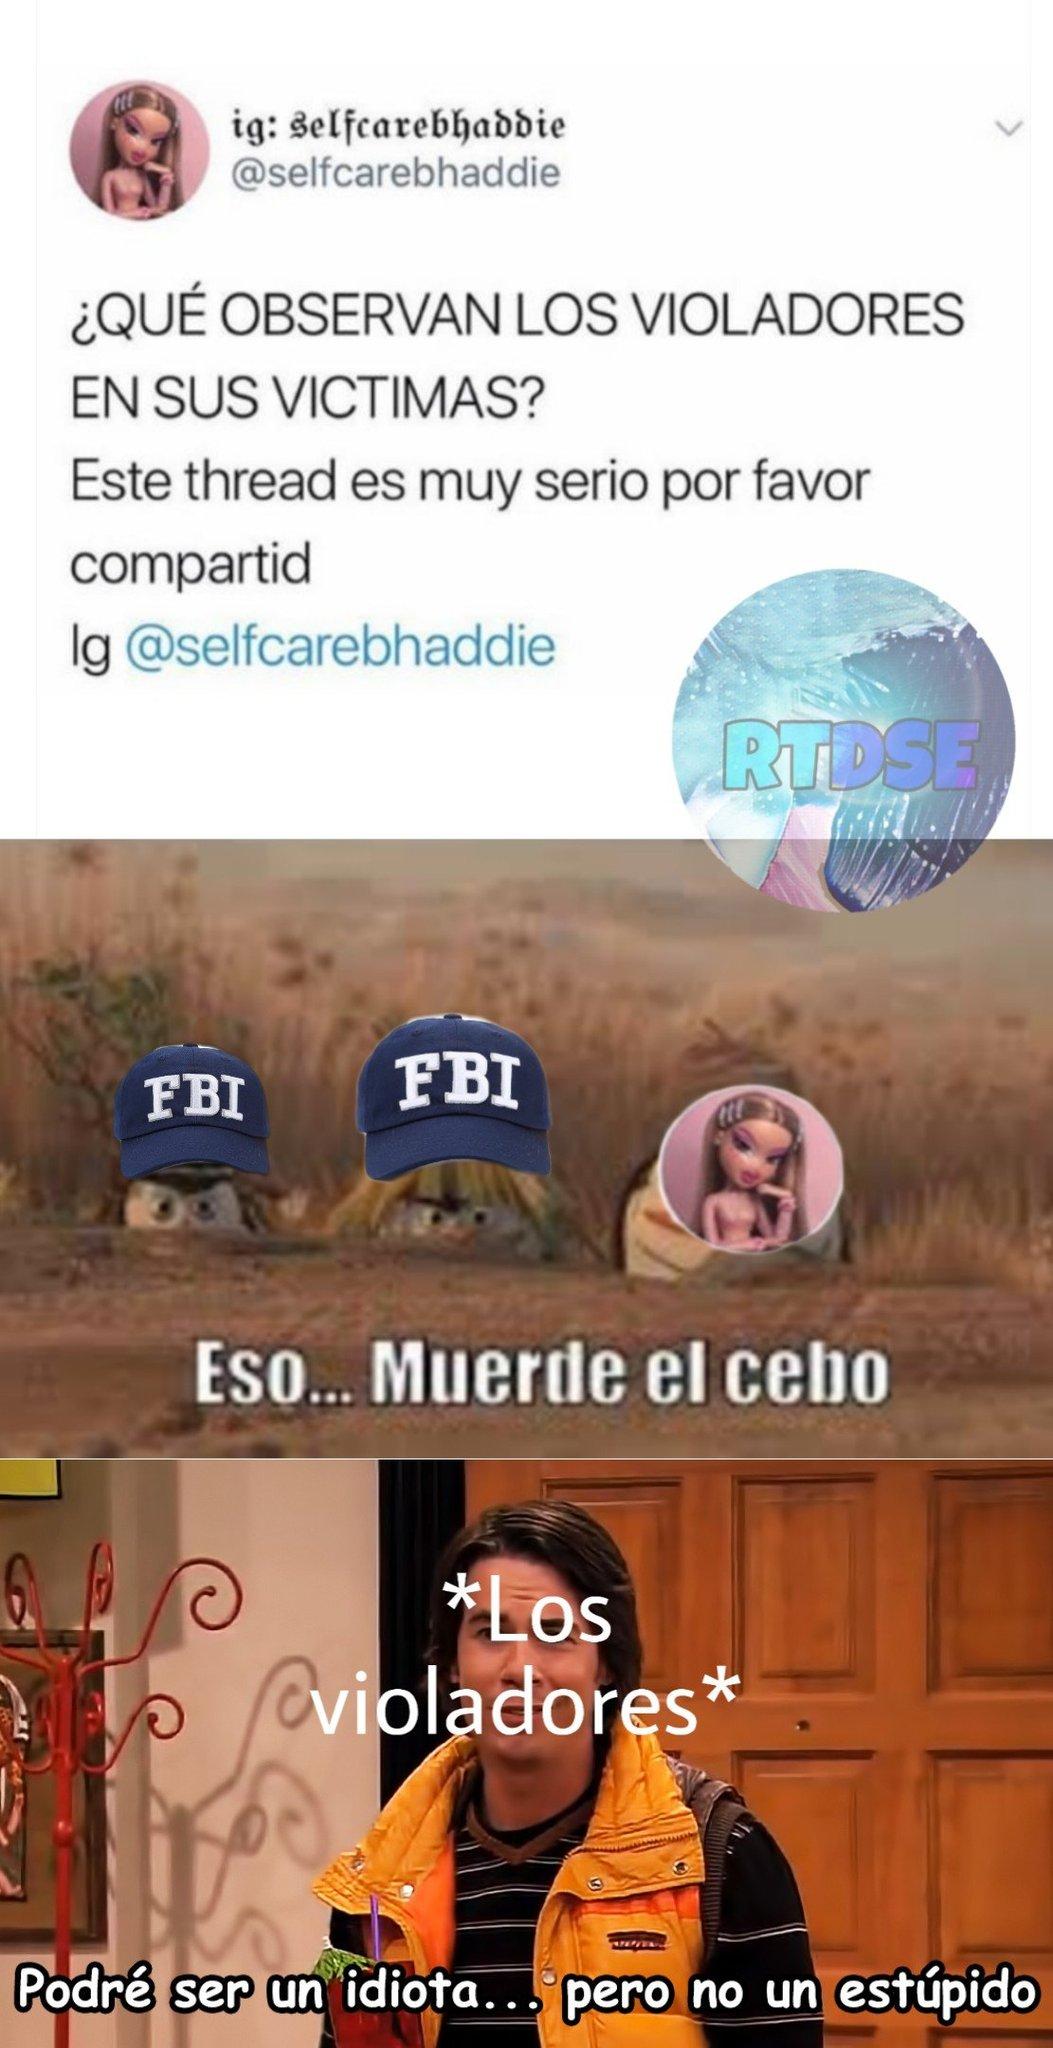 Tácticas del fbi para atrapar violadores - meme